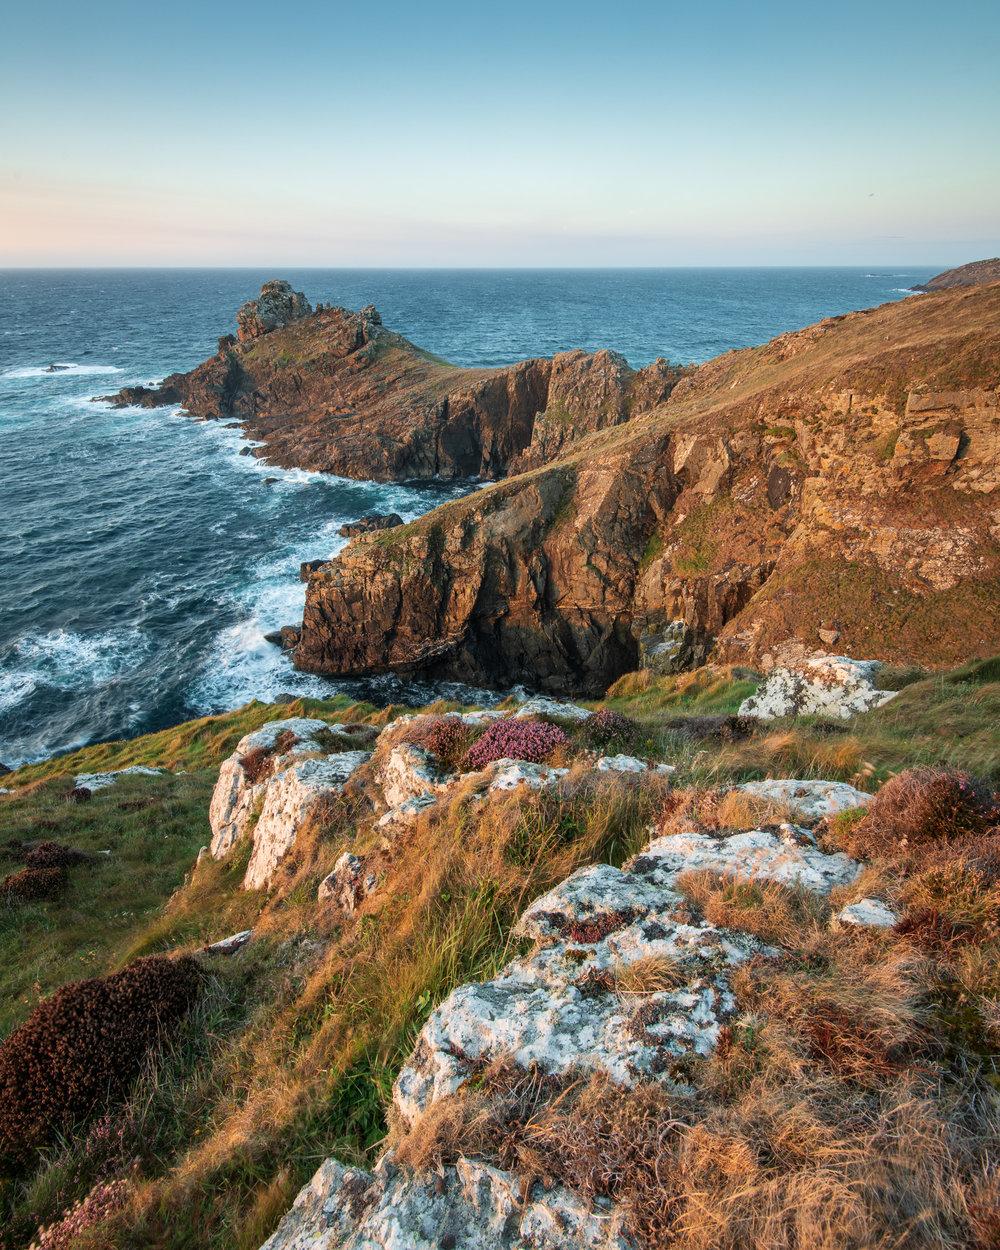 Gurnard's Head Sunset #2, Cornwall  - Nikon D850, Nikkor 16-35 mm f/4 at 16 mm, 0.4 secs at ISO 64, f/13, Lee Filters ND Grad.